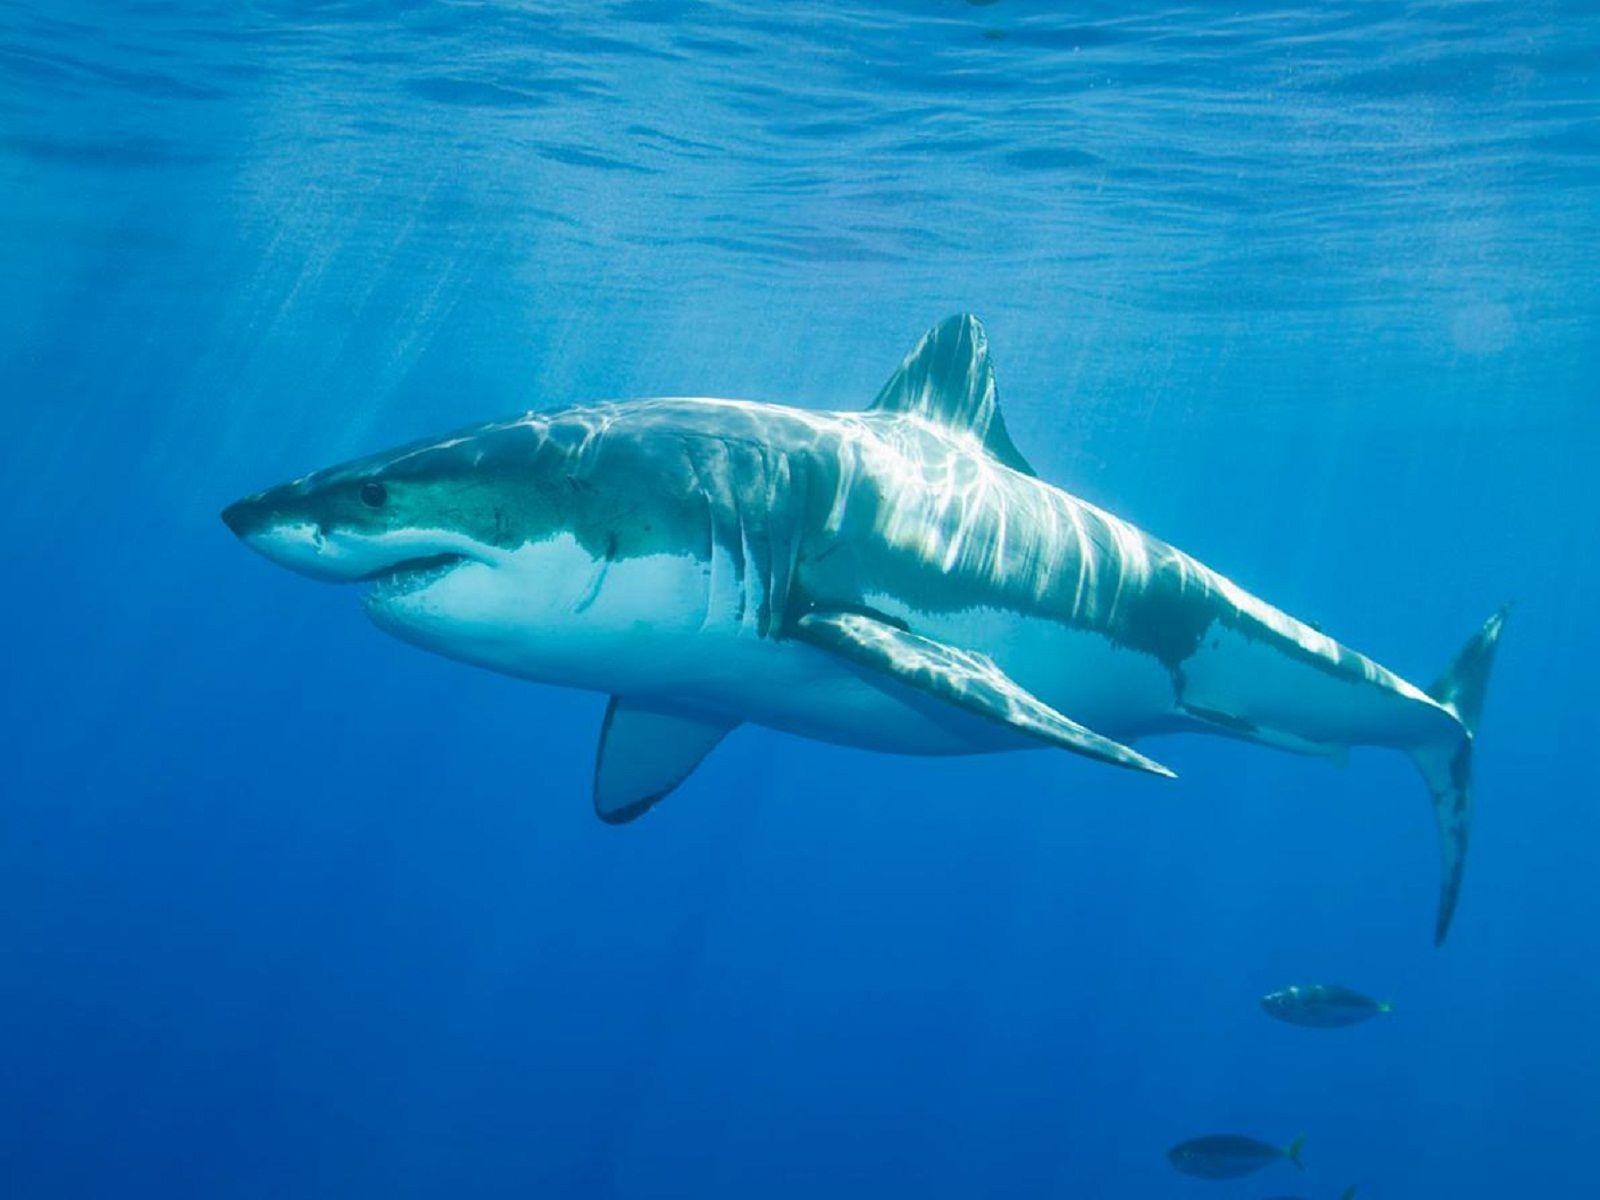 Great Barrier Reef Australia Sharks - Australia Places Ideas